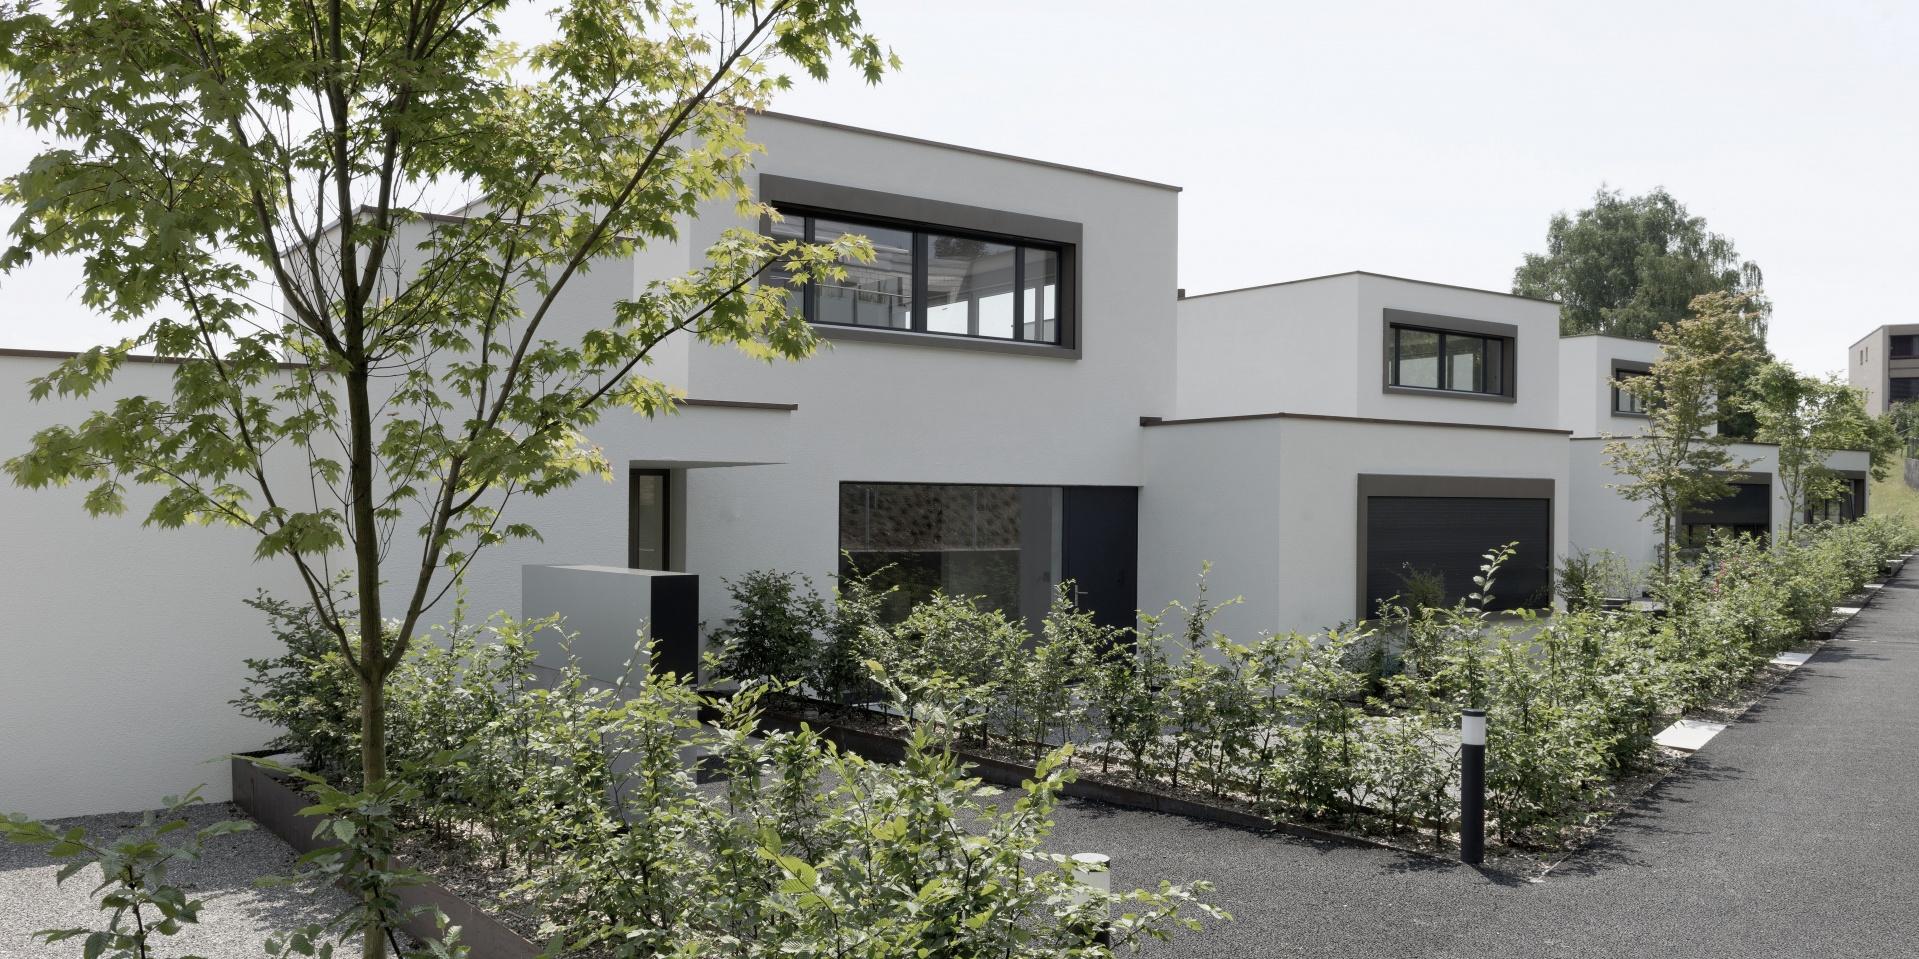 Fassade  © René Rötheli, Atelier Fotografie, Bruggerstrasse 37 5400 Baden